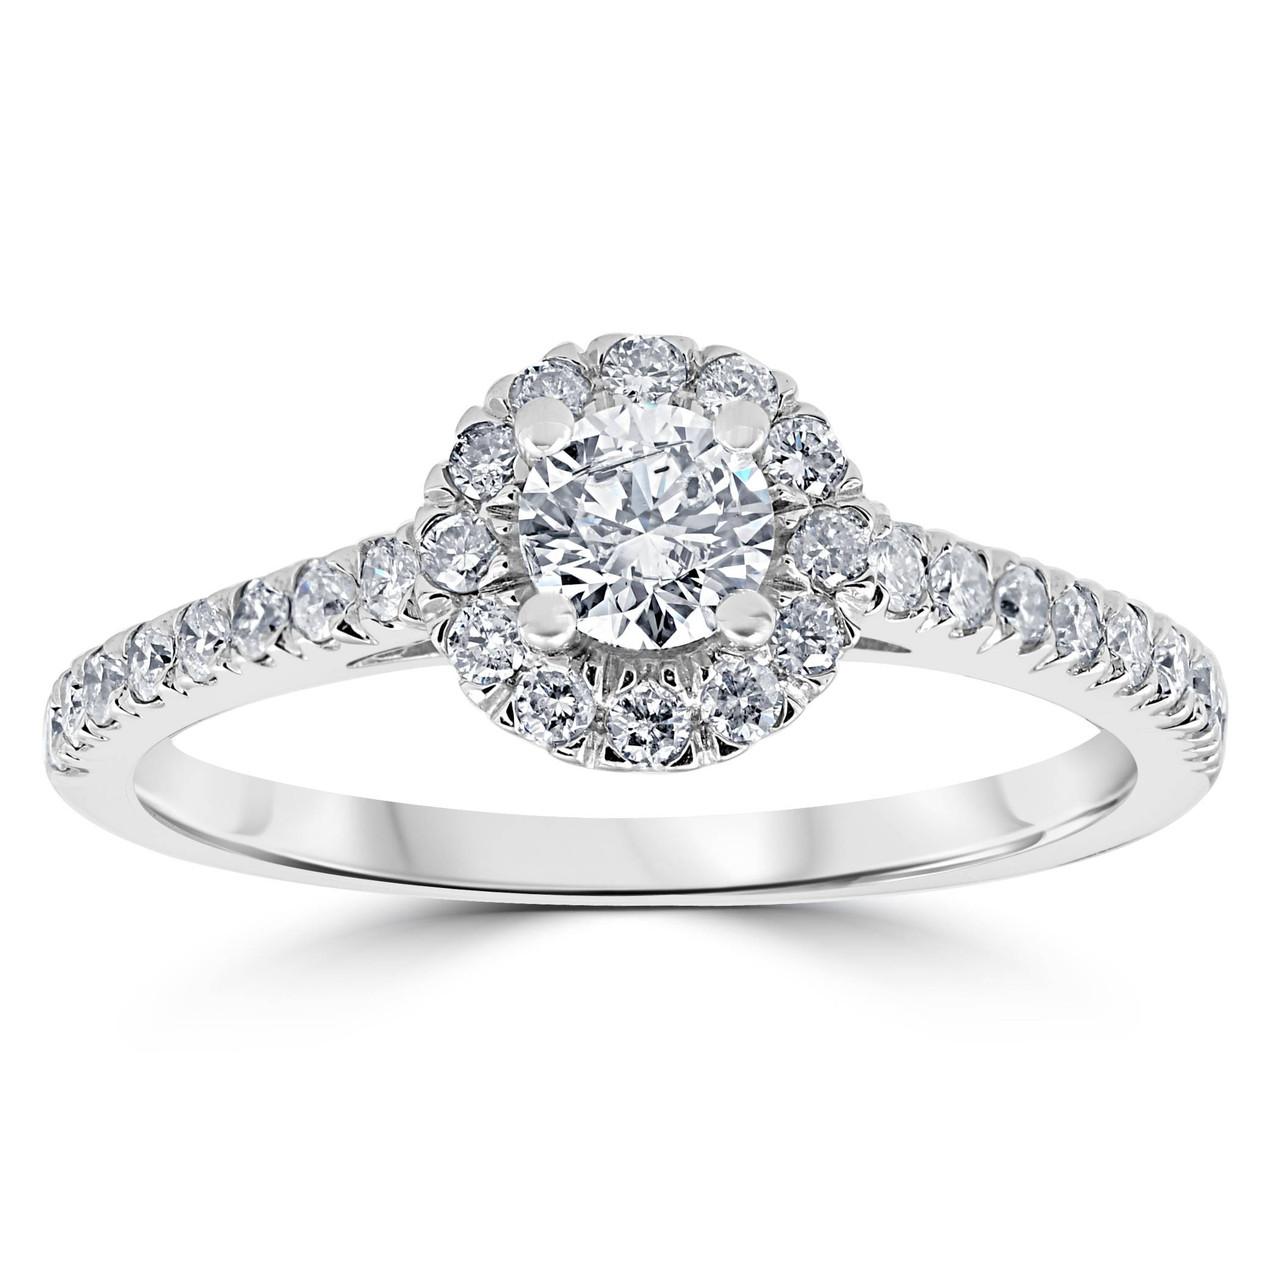 7 8ct Halo Lab Created Diamond Engagement Ring 14k White Gold